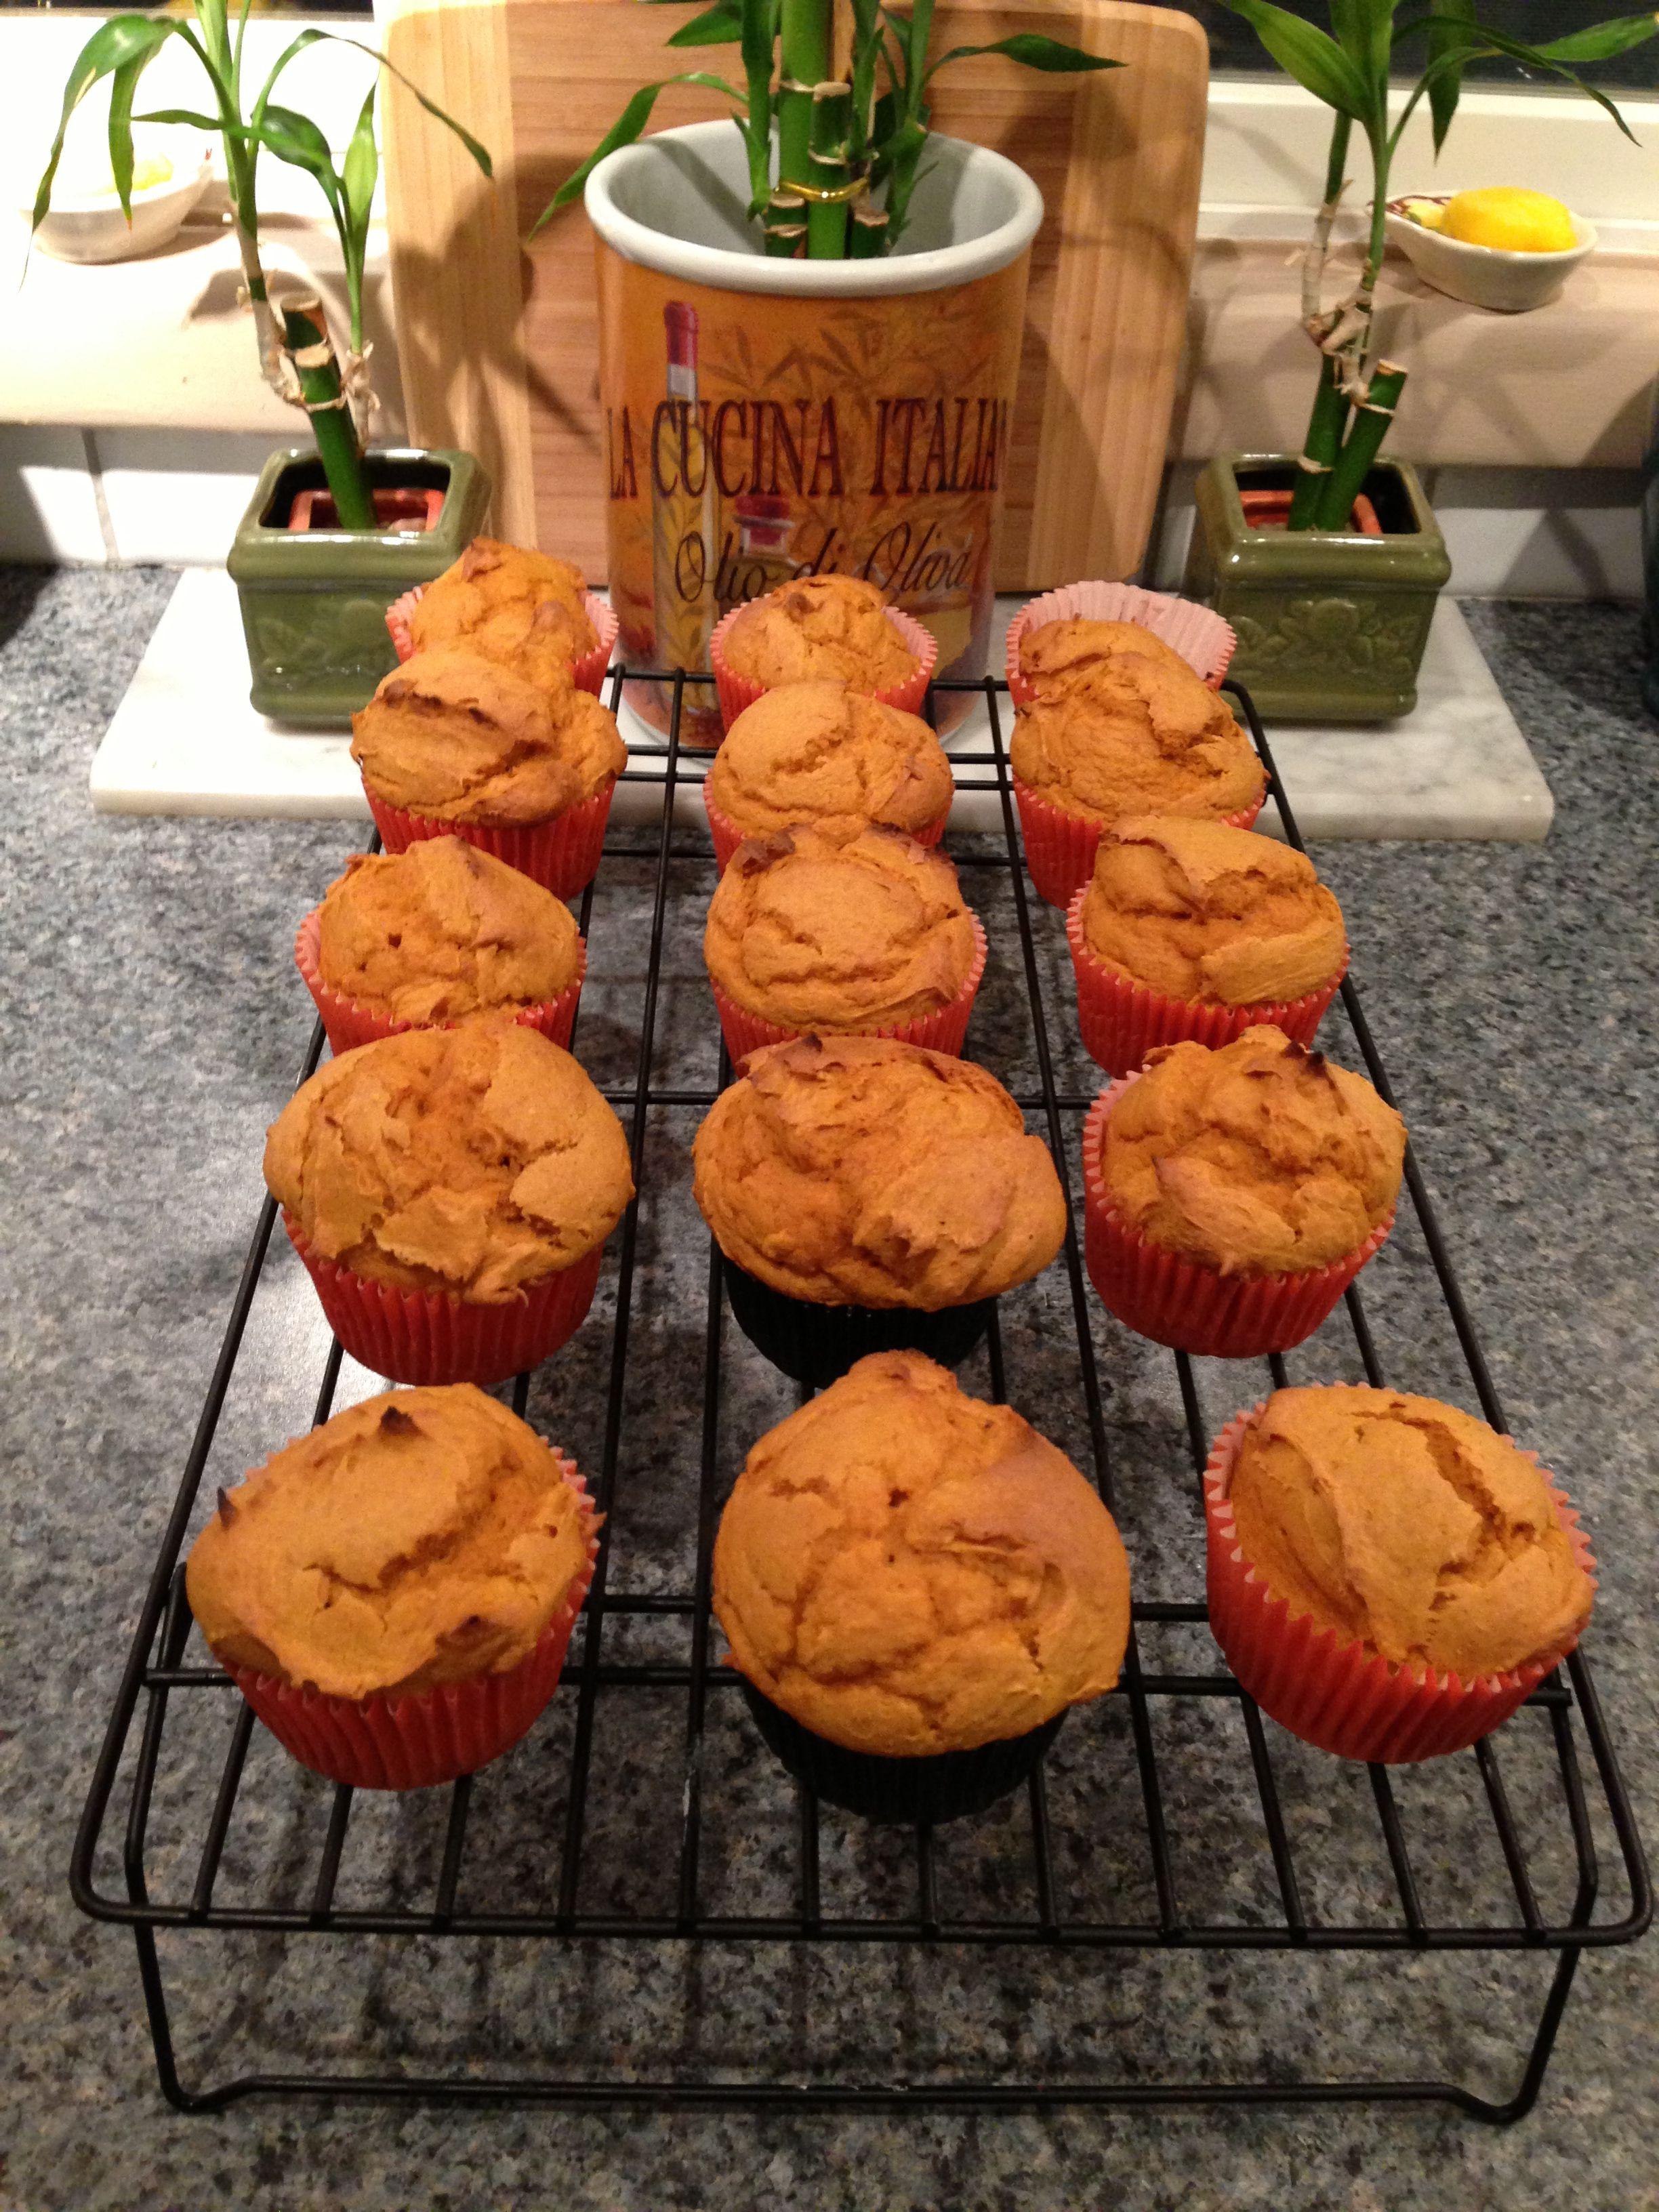 Easy pumpkin muffins 1 box duncan hines white cake mix